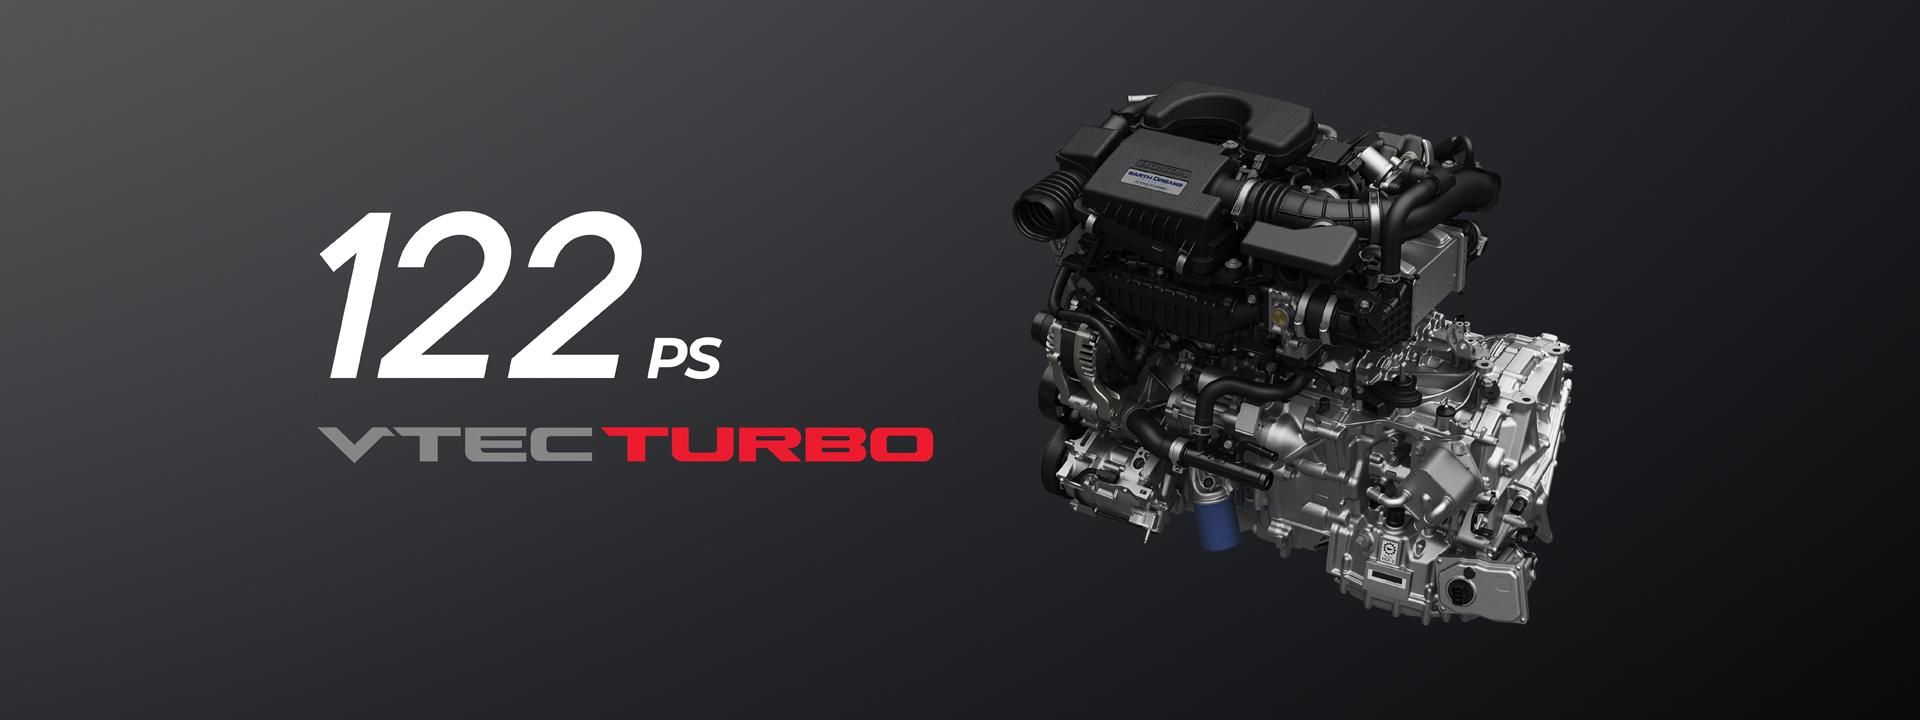 Honda City Hatchback Engine